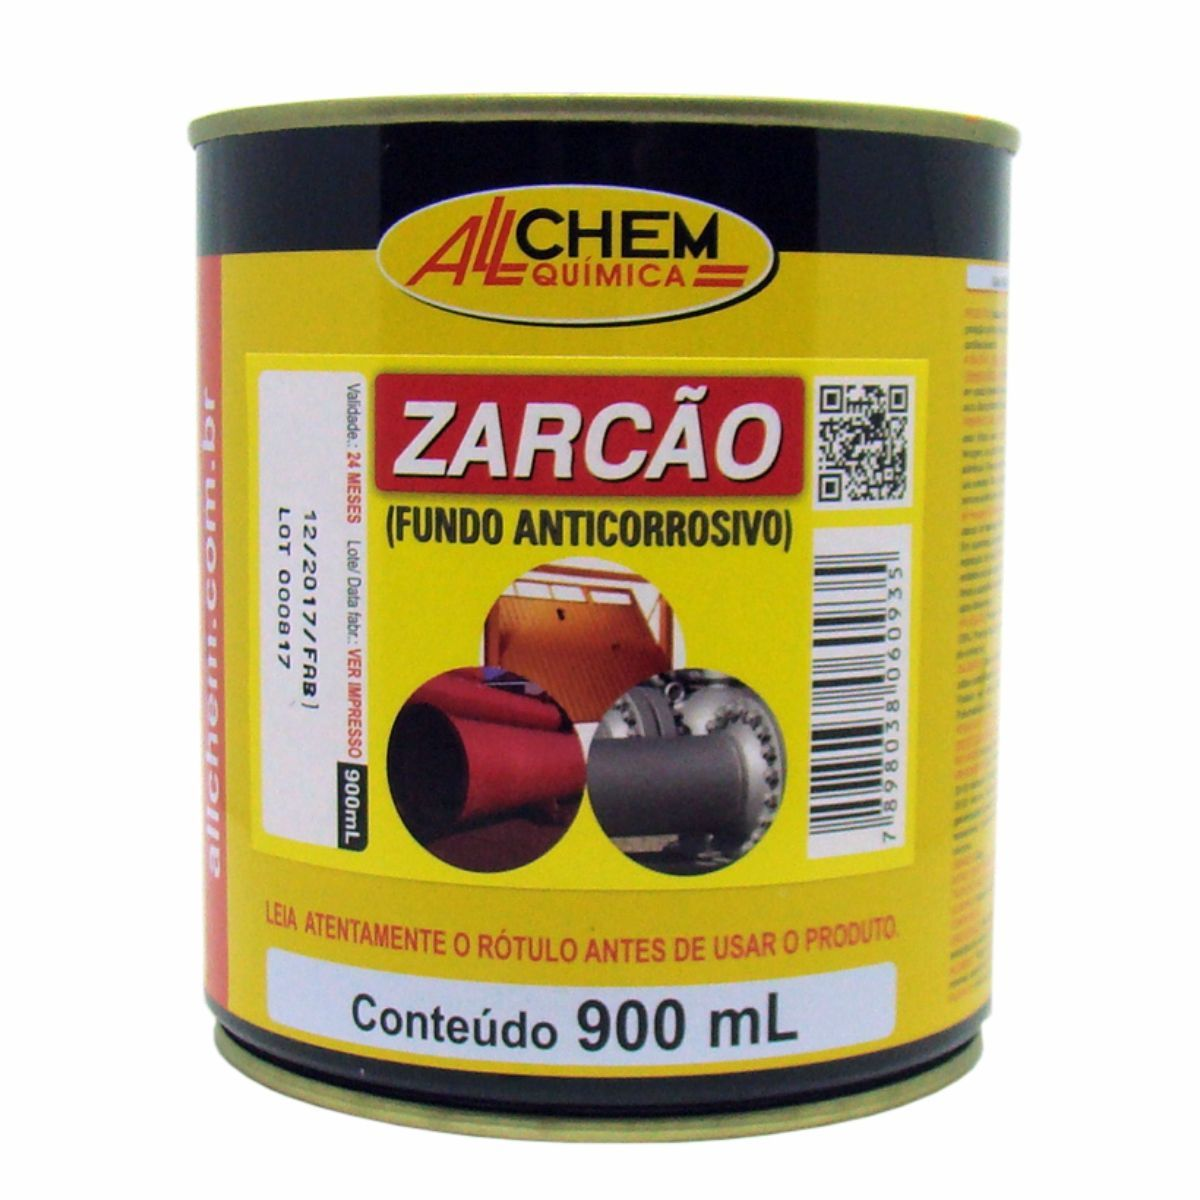 Fundo Anticorrosivo Zarcão 4x900 mL